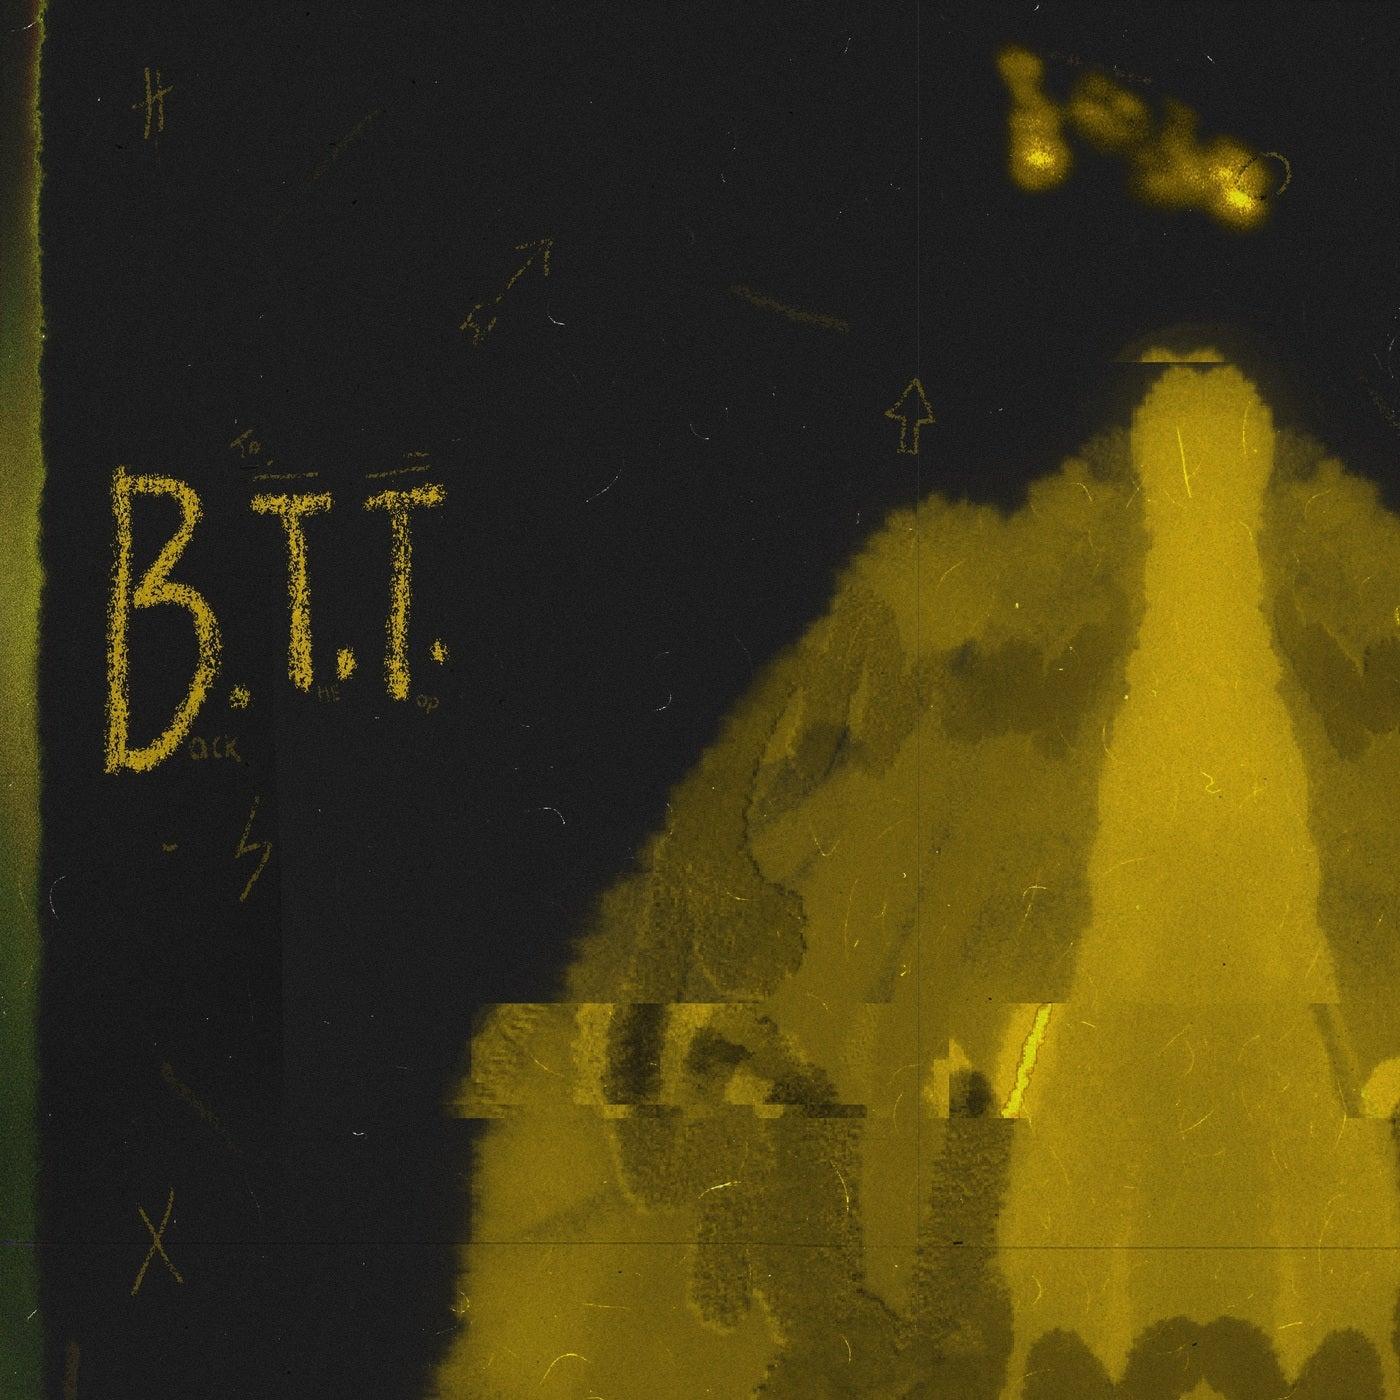 B.T.T. (Original Mix)